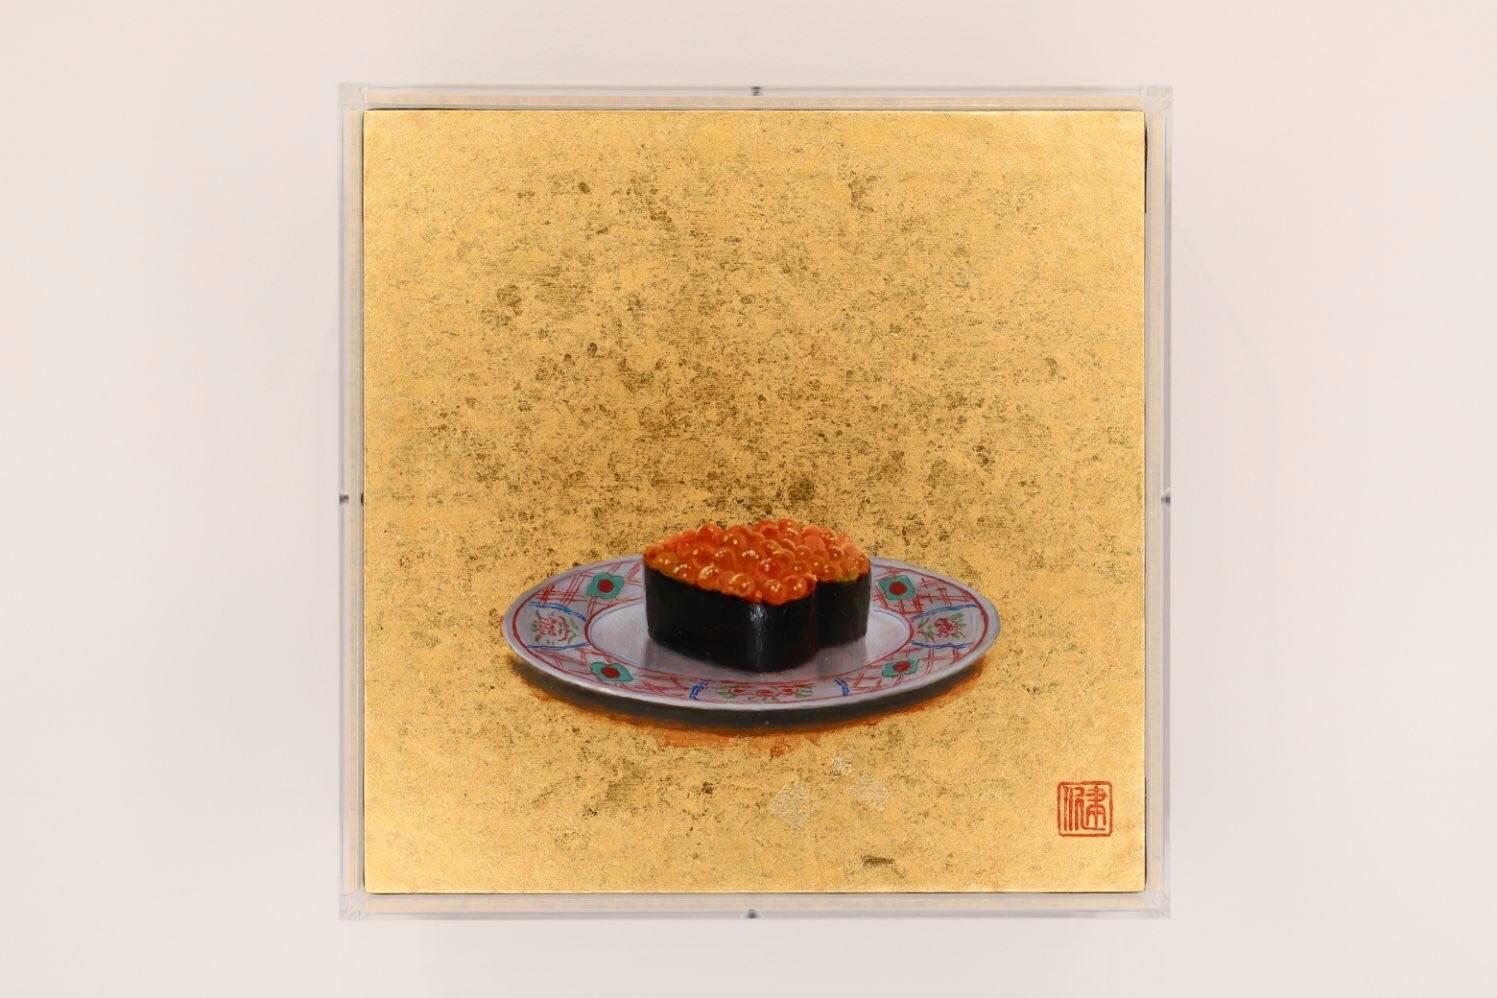 Sushi - Salmon roe